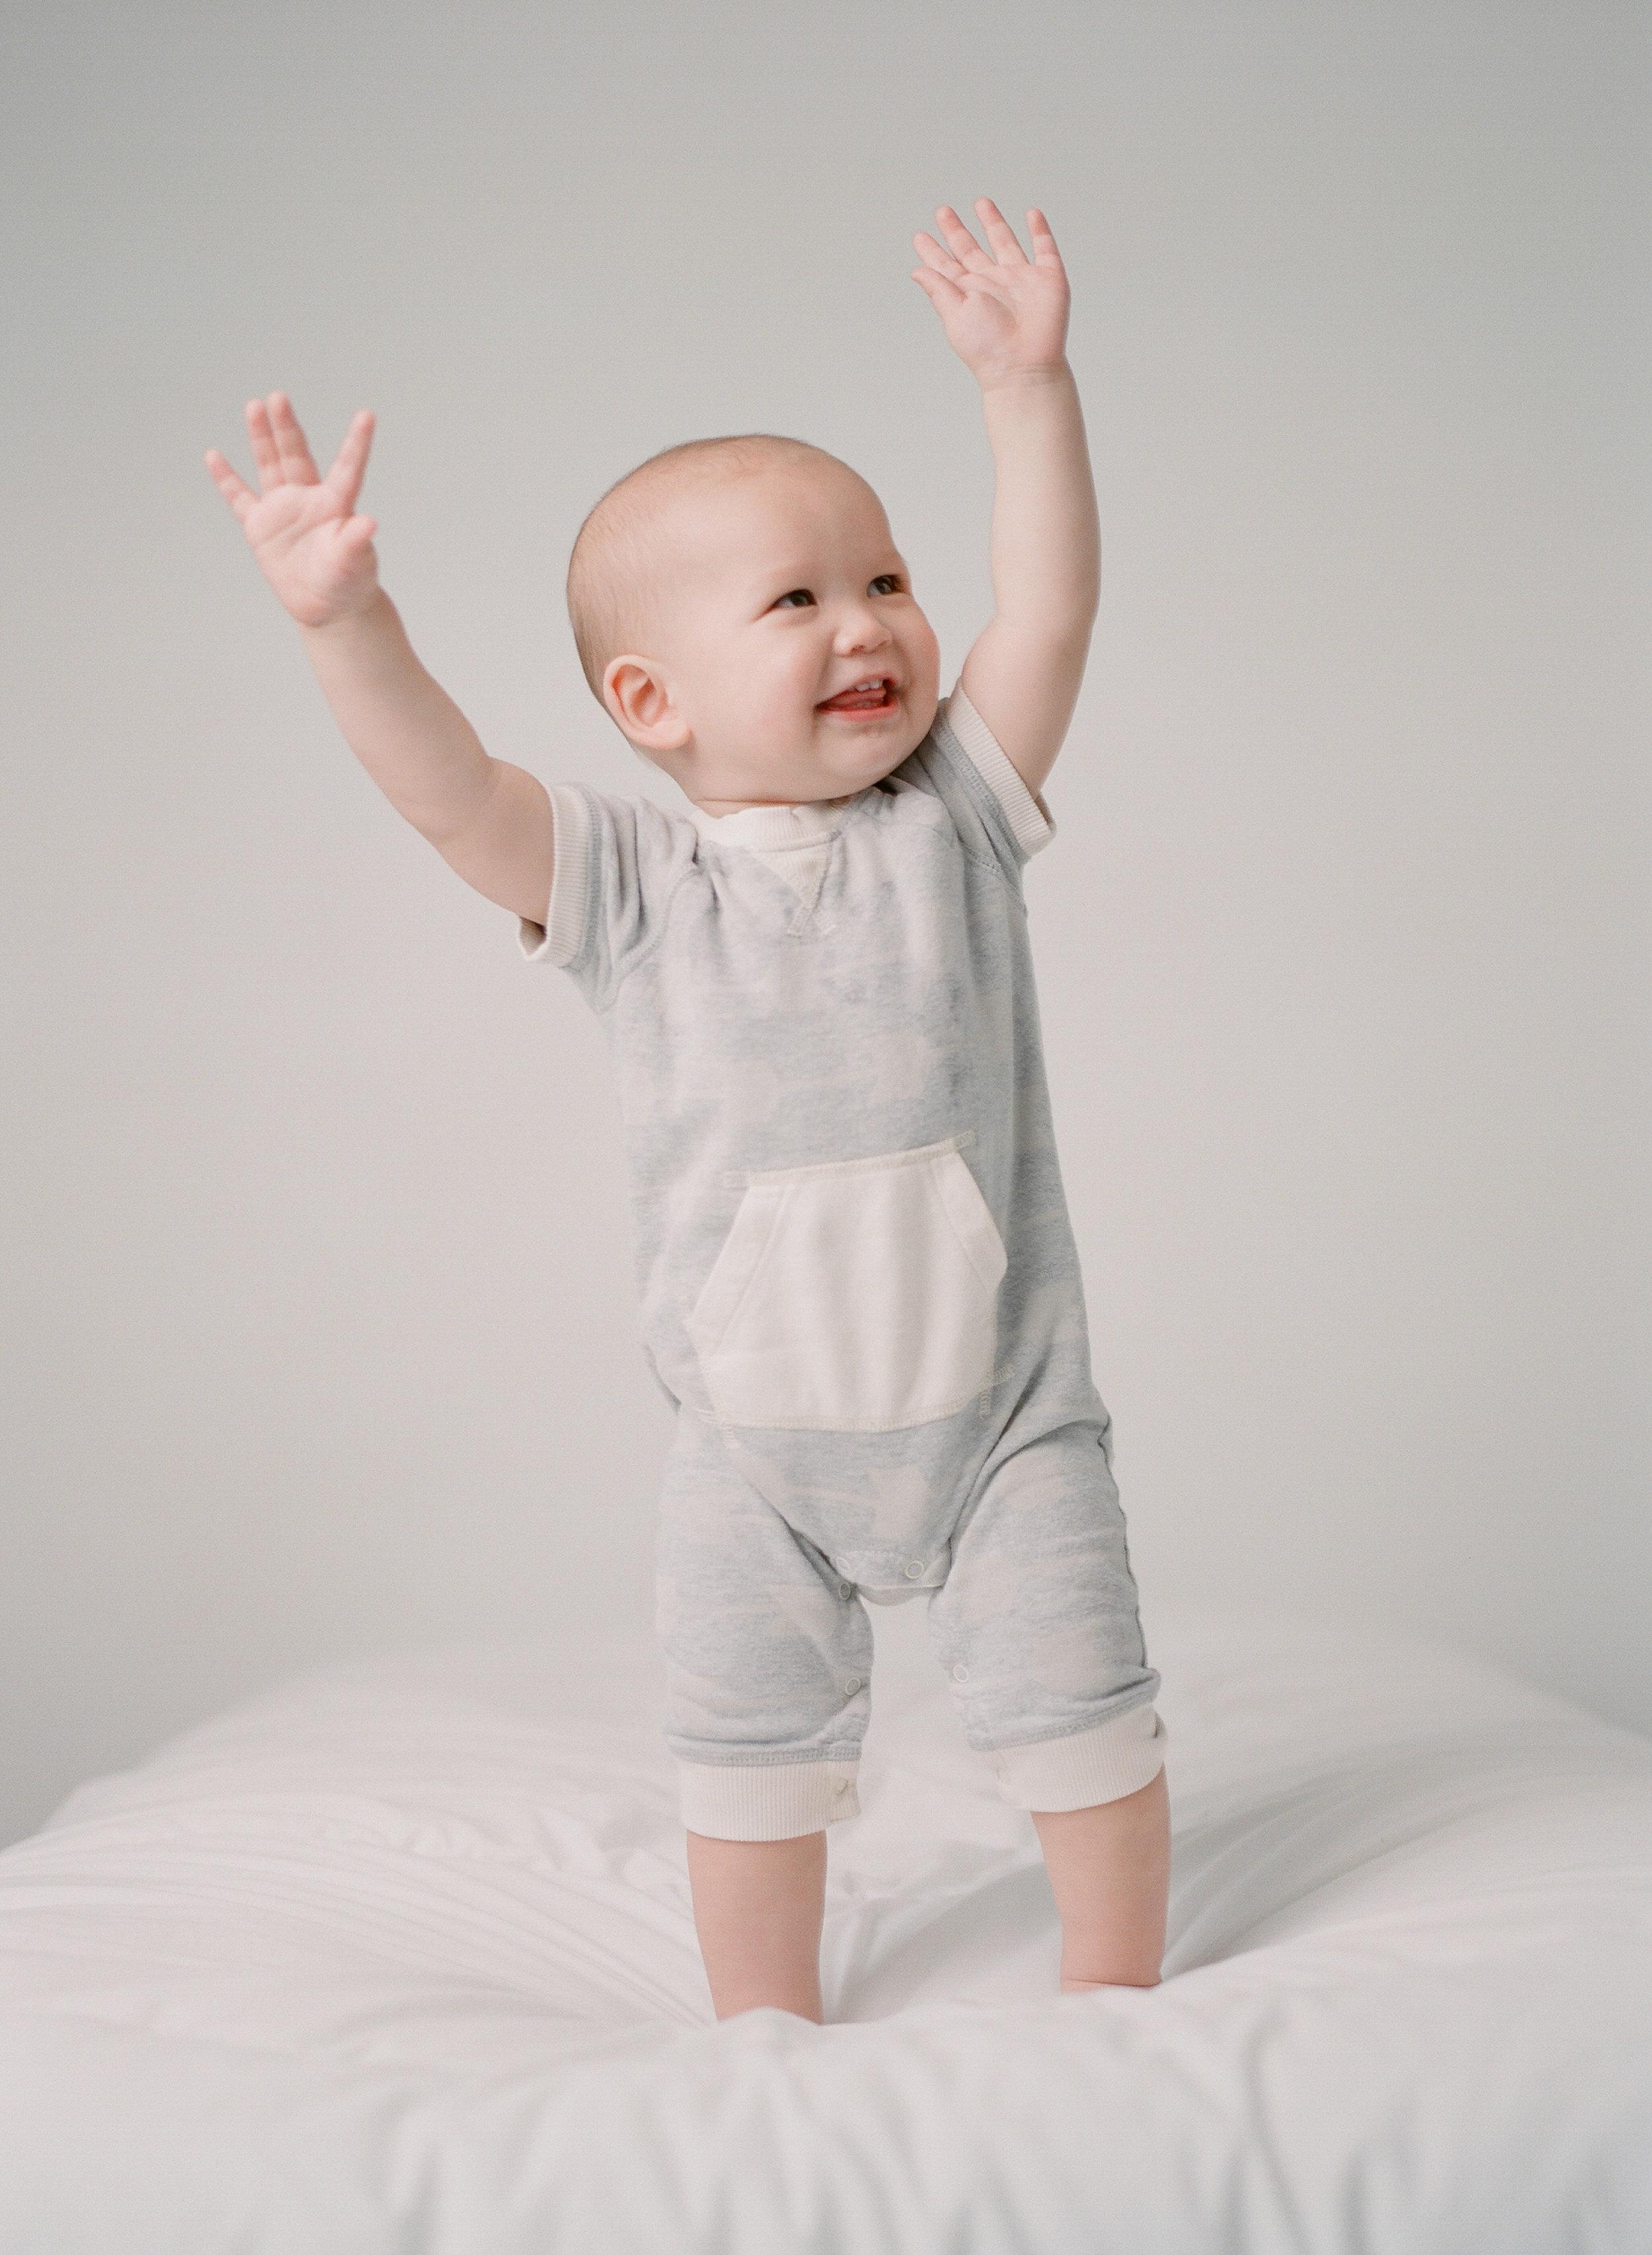 Contact Seattle Newborn Photographer Sandra Coan